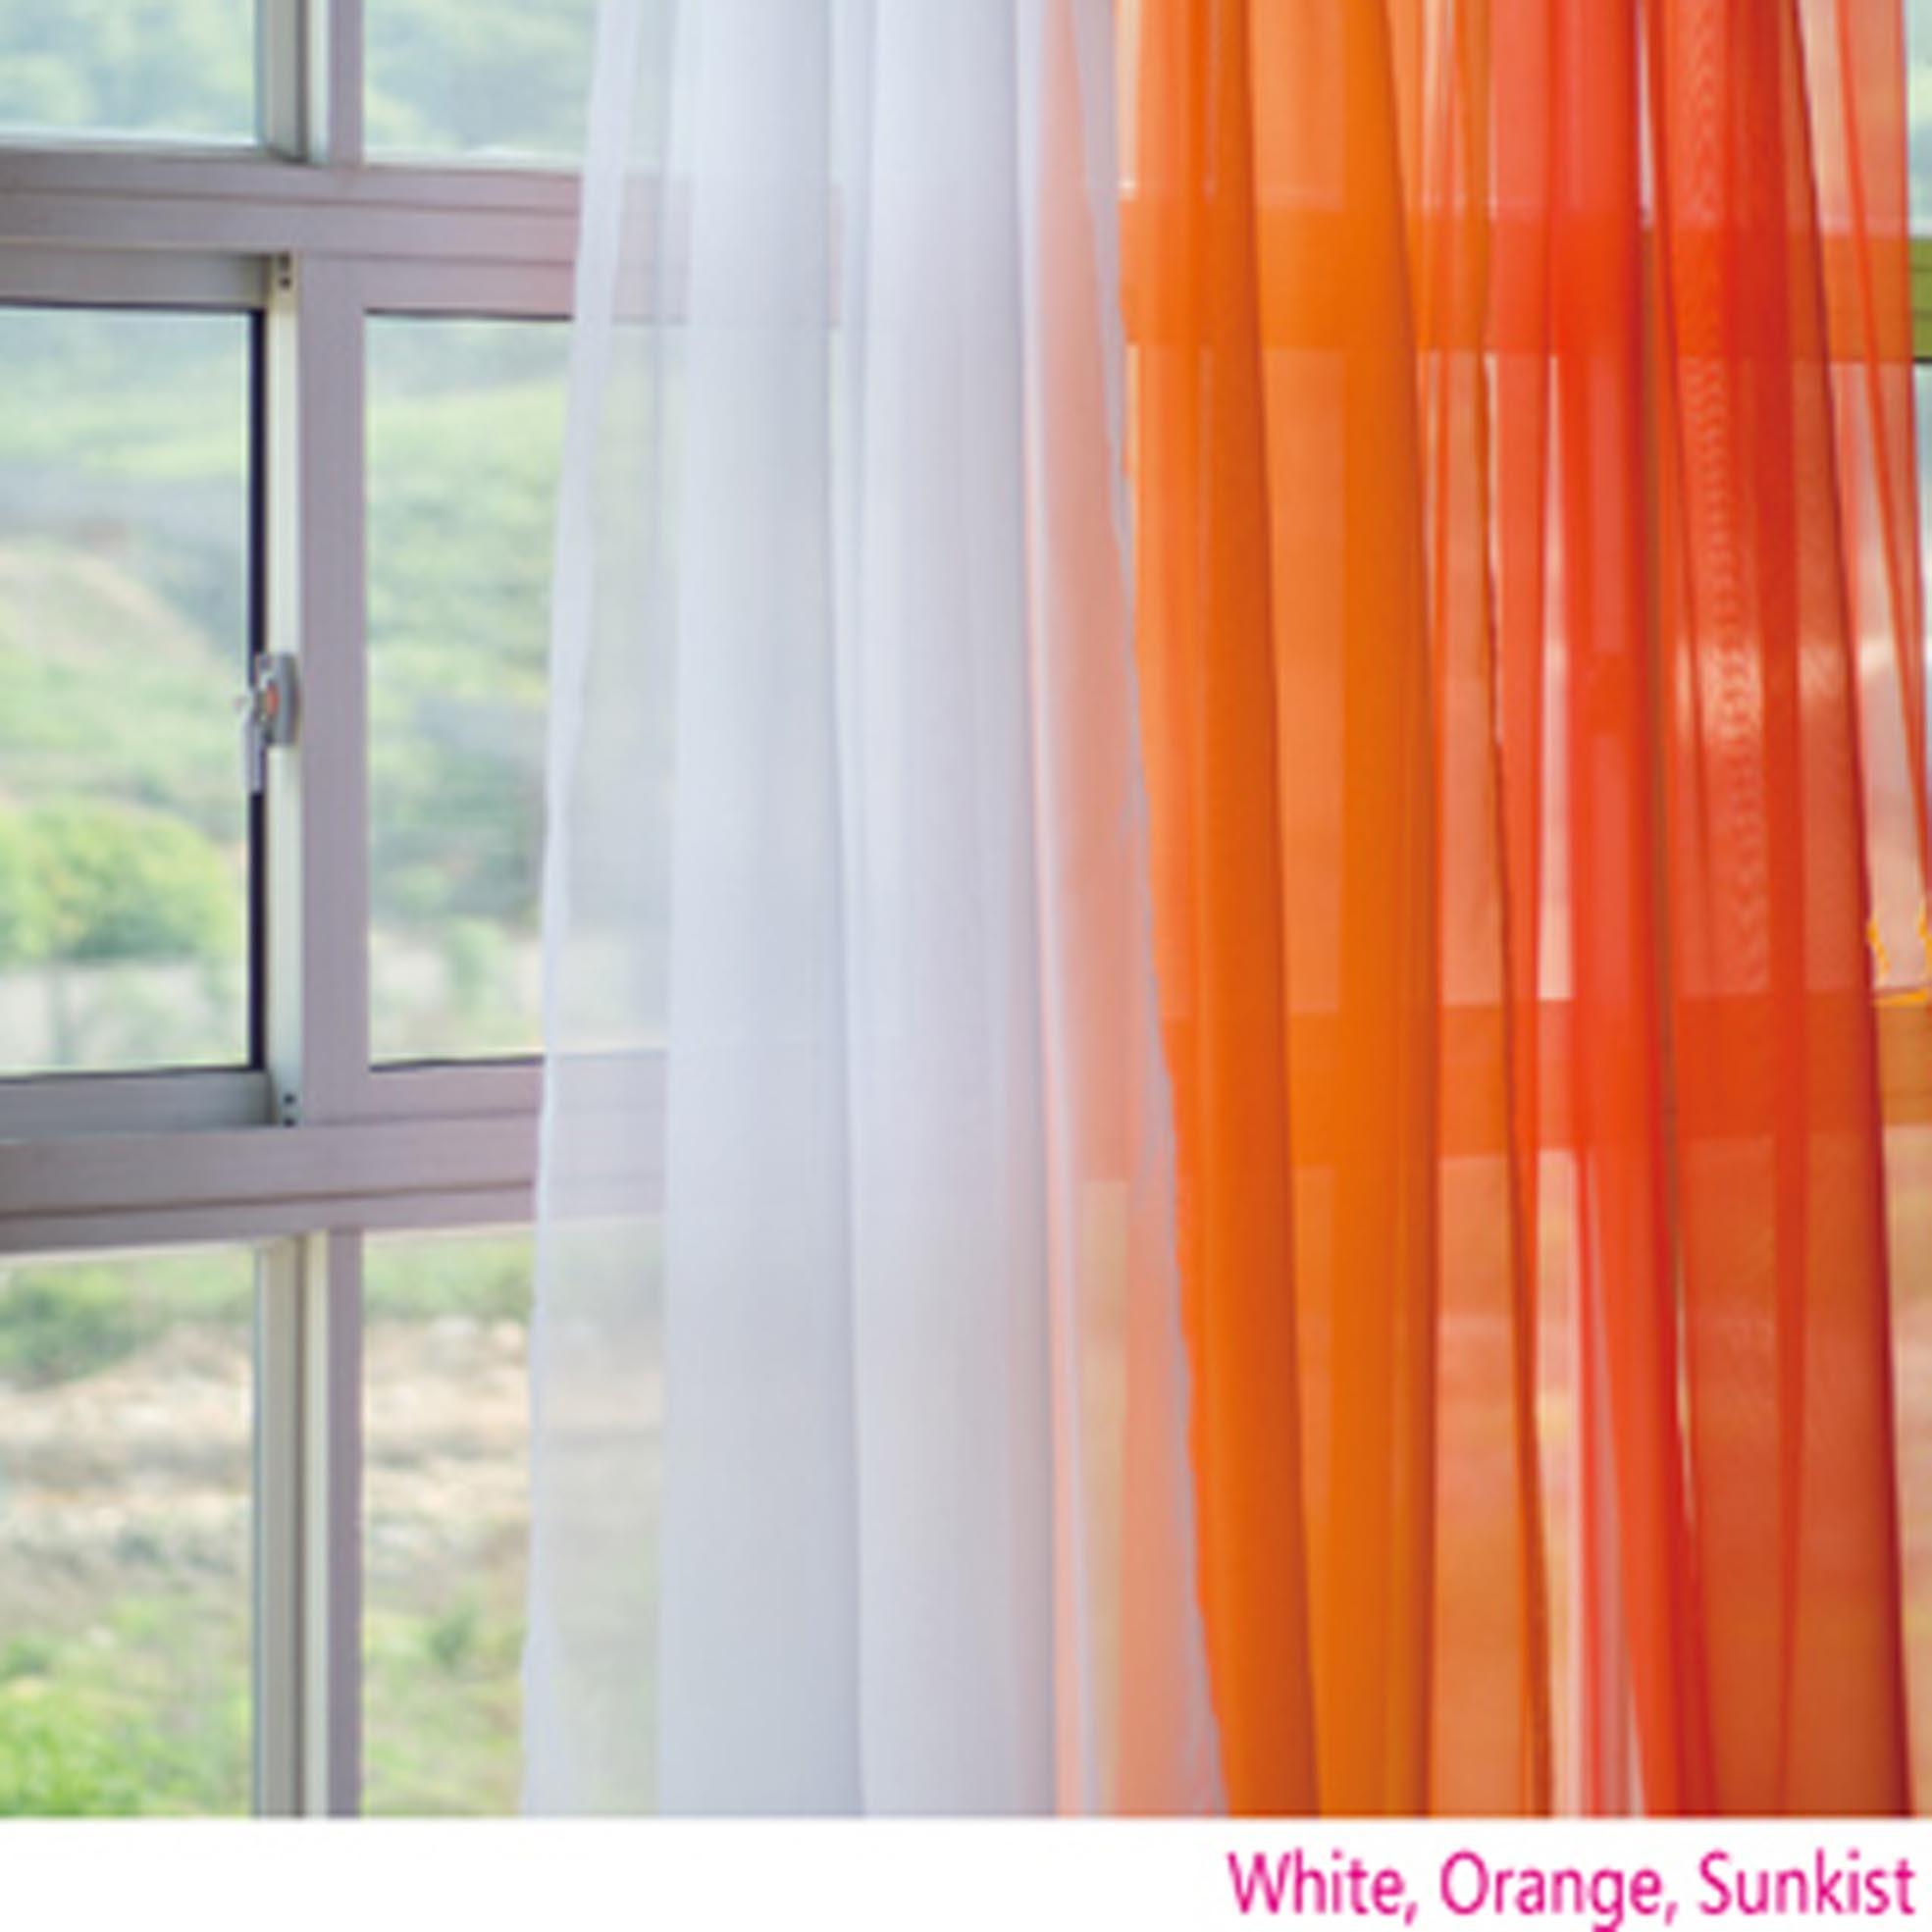 treatments curtains valance reviews wayfair curtain pdx hampton of window sheer scarf martinson voile house